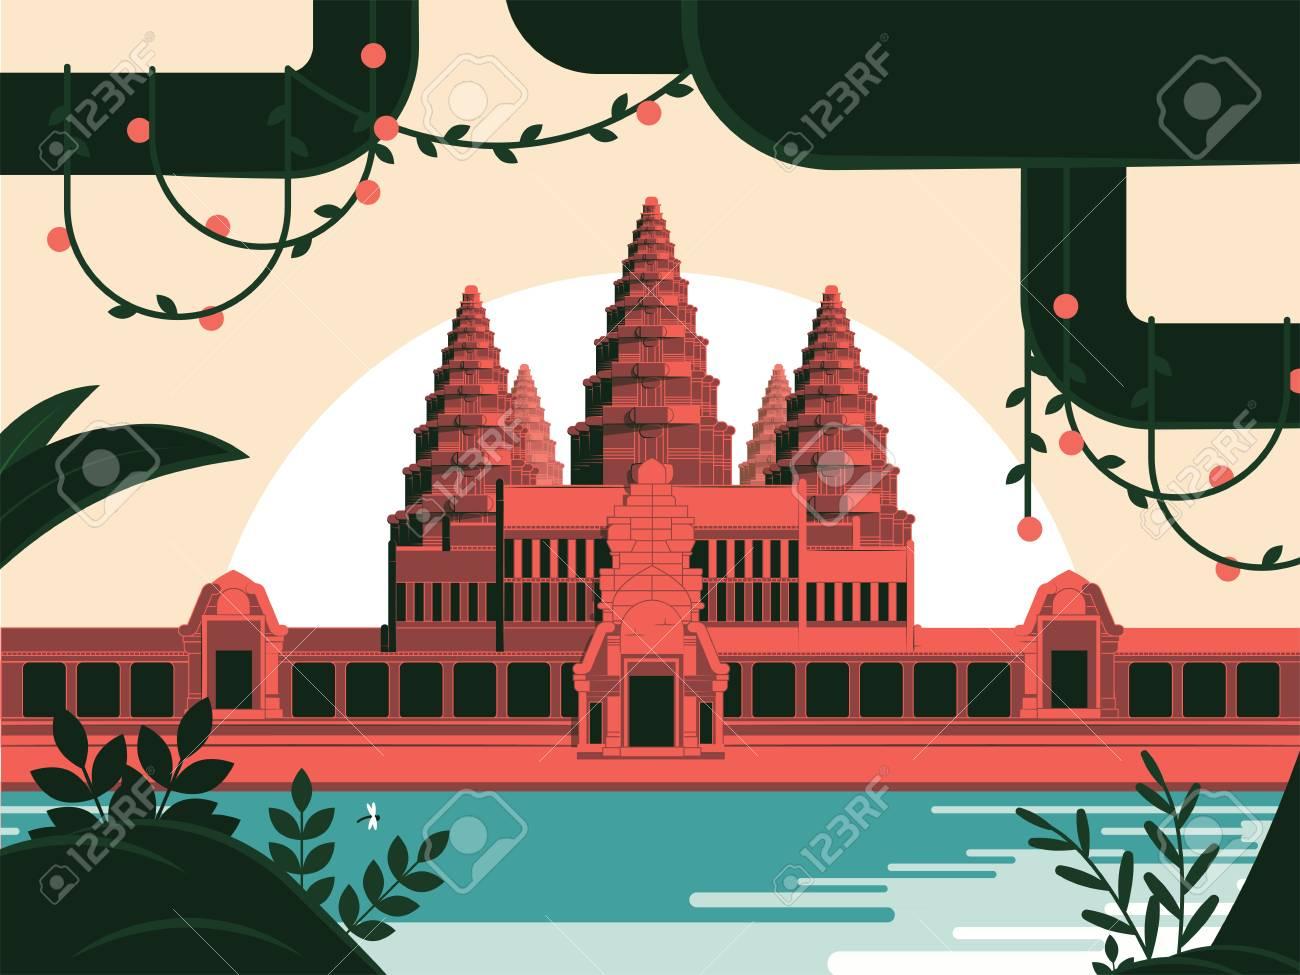 Angkor Wat Khmer temple in Siem Reap illustration - 107660827